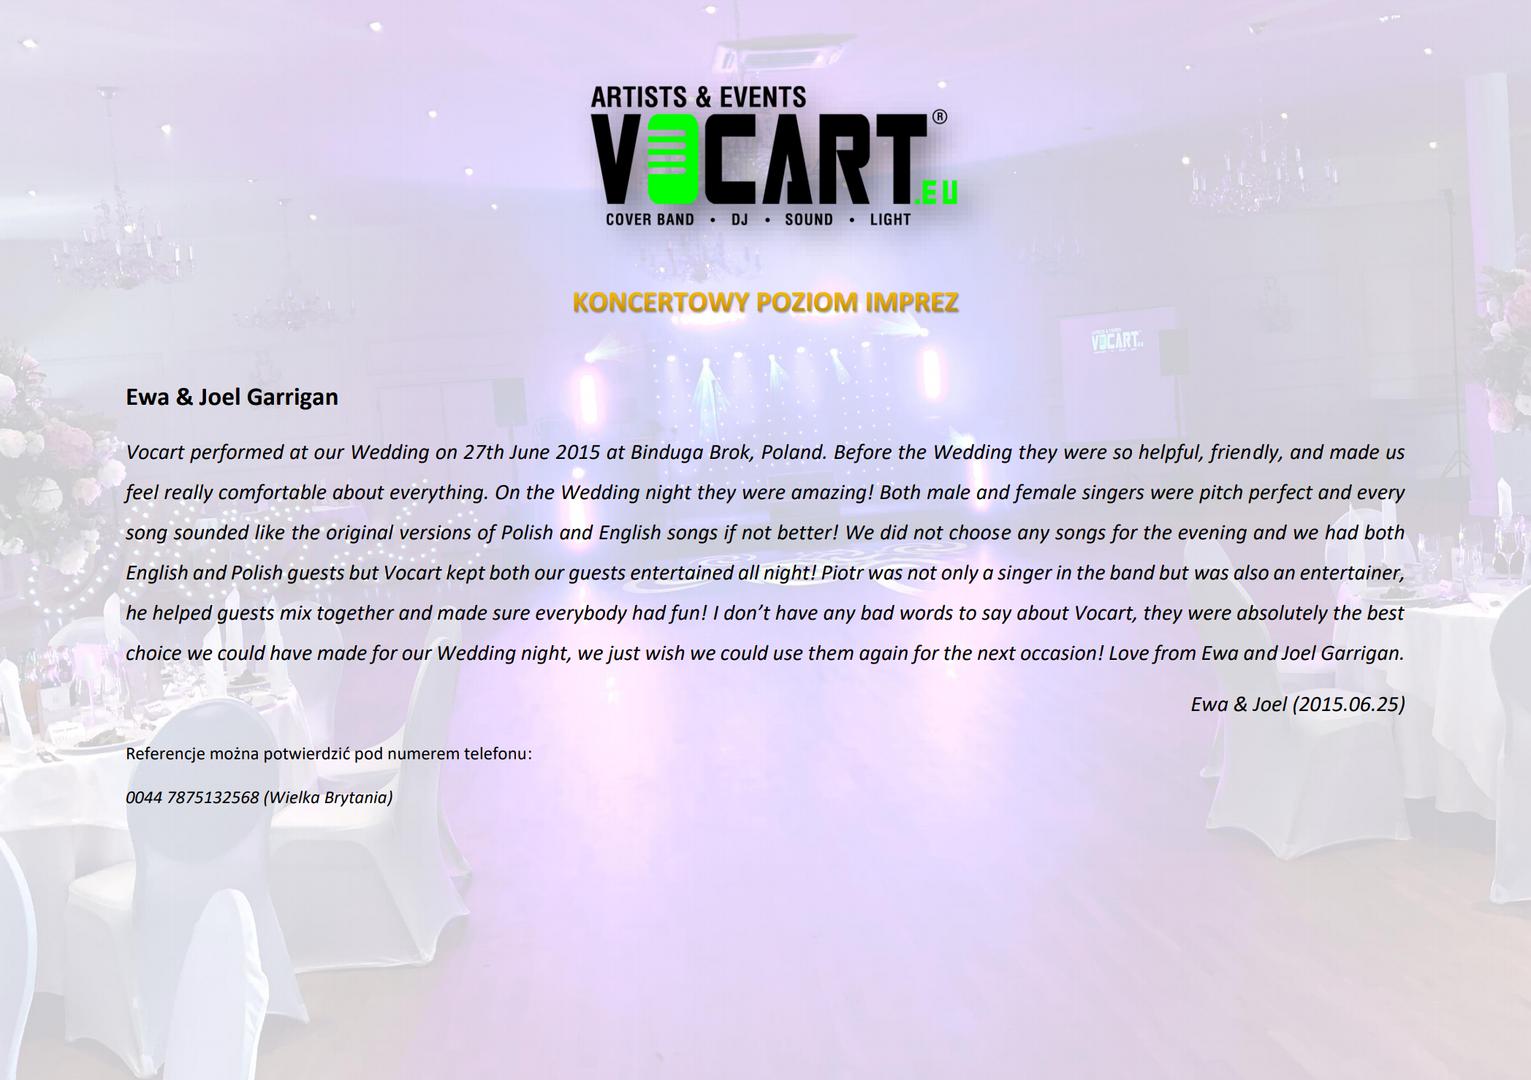 VOCART - Referencje - 2015.06.25 - Ewa &